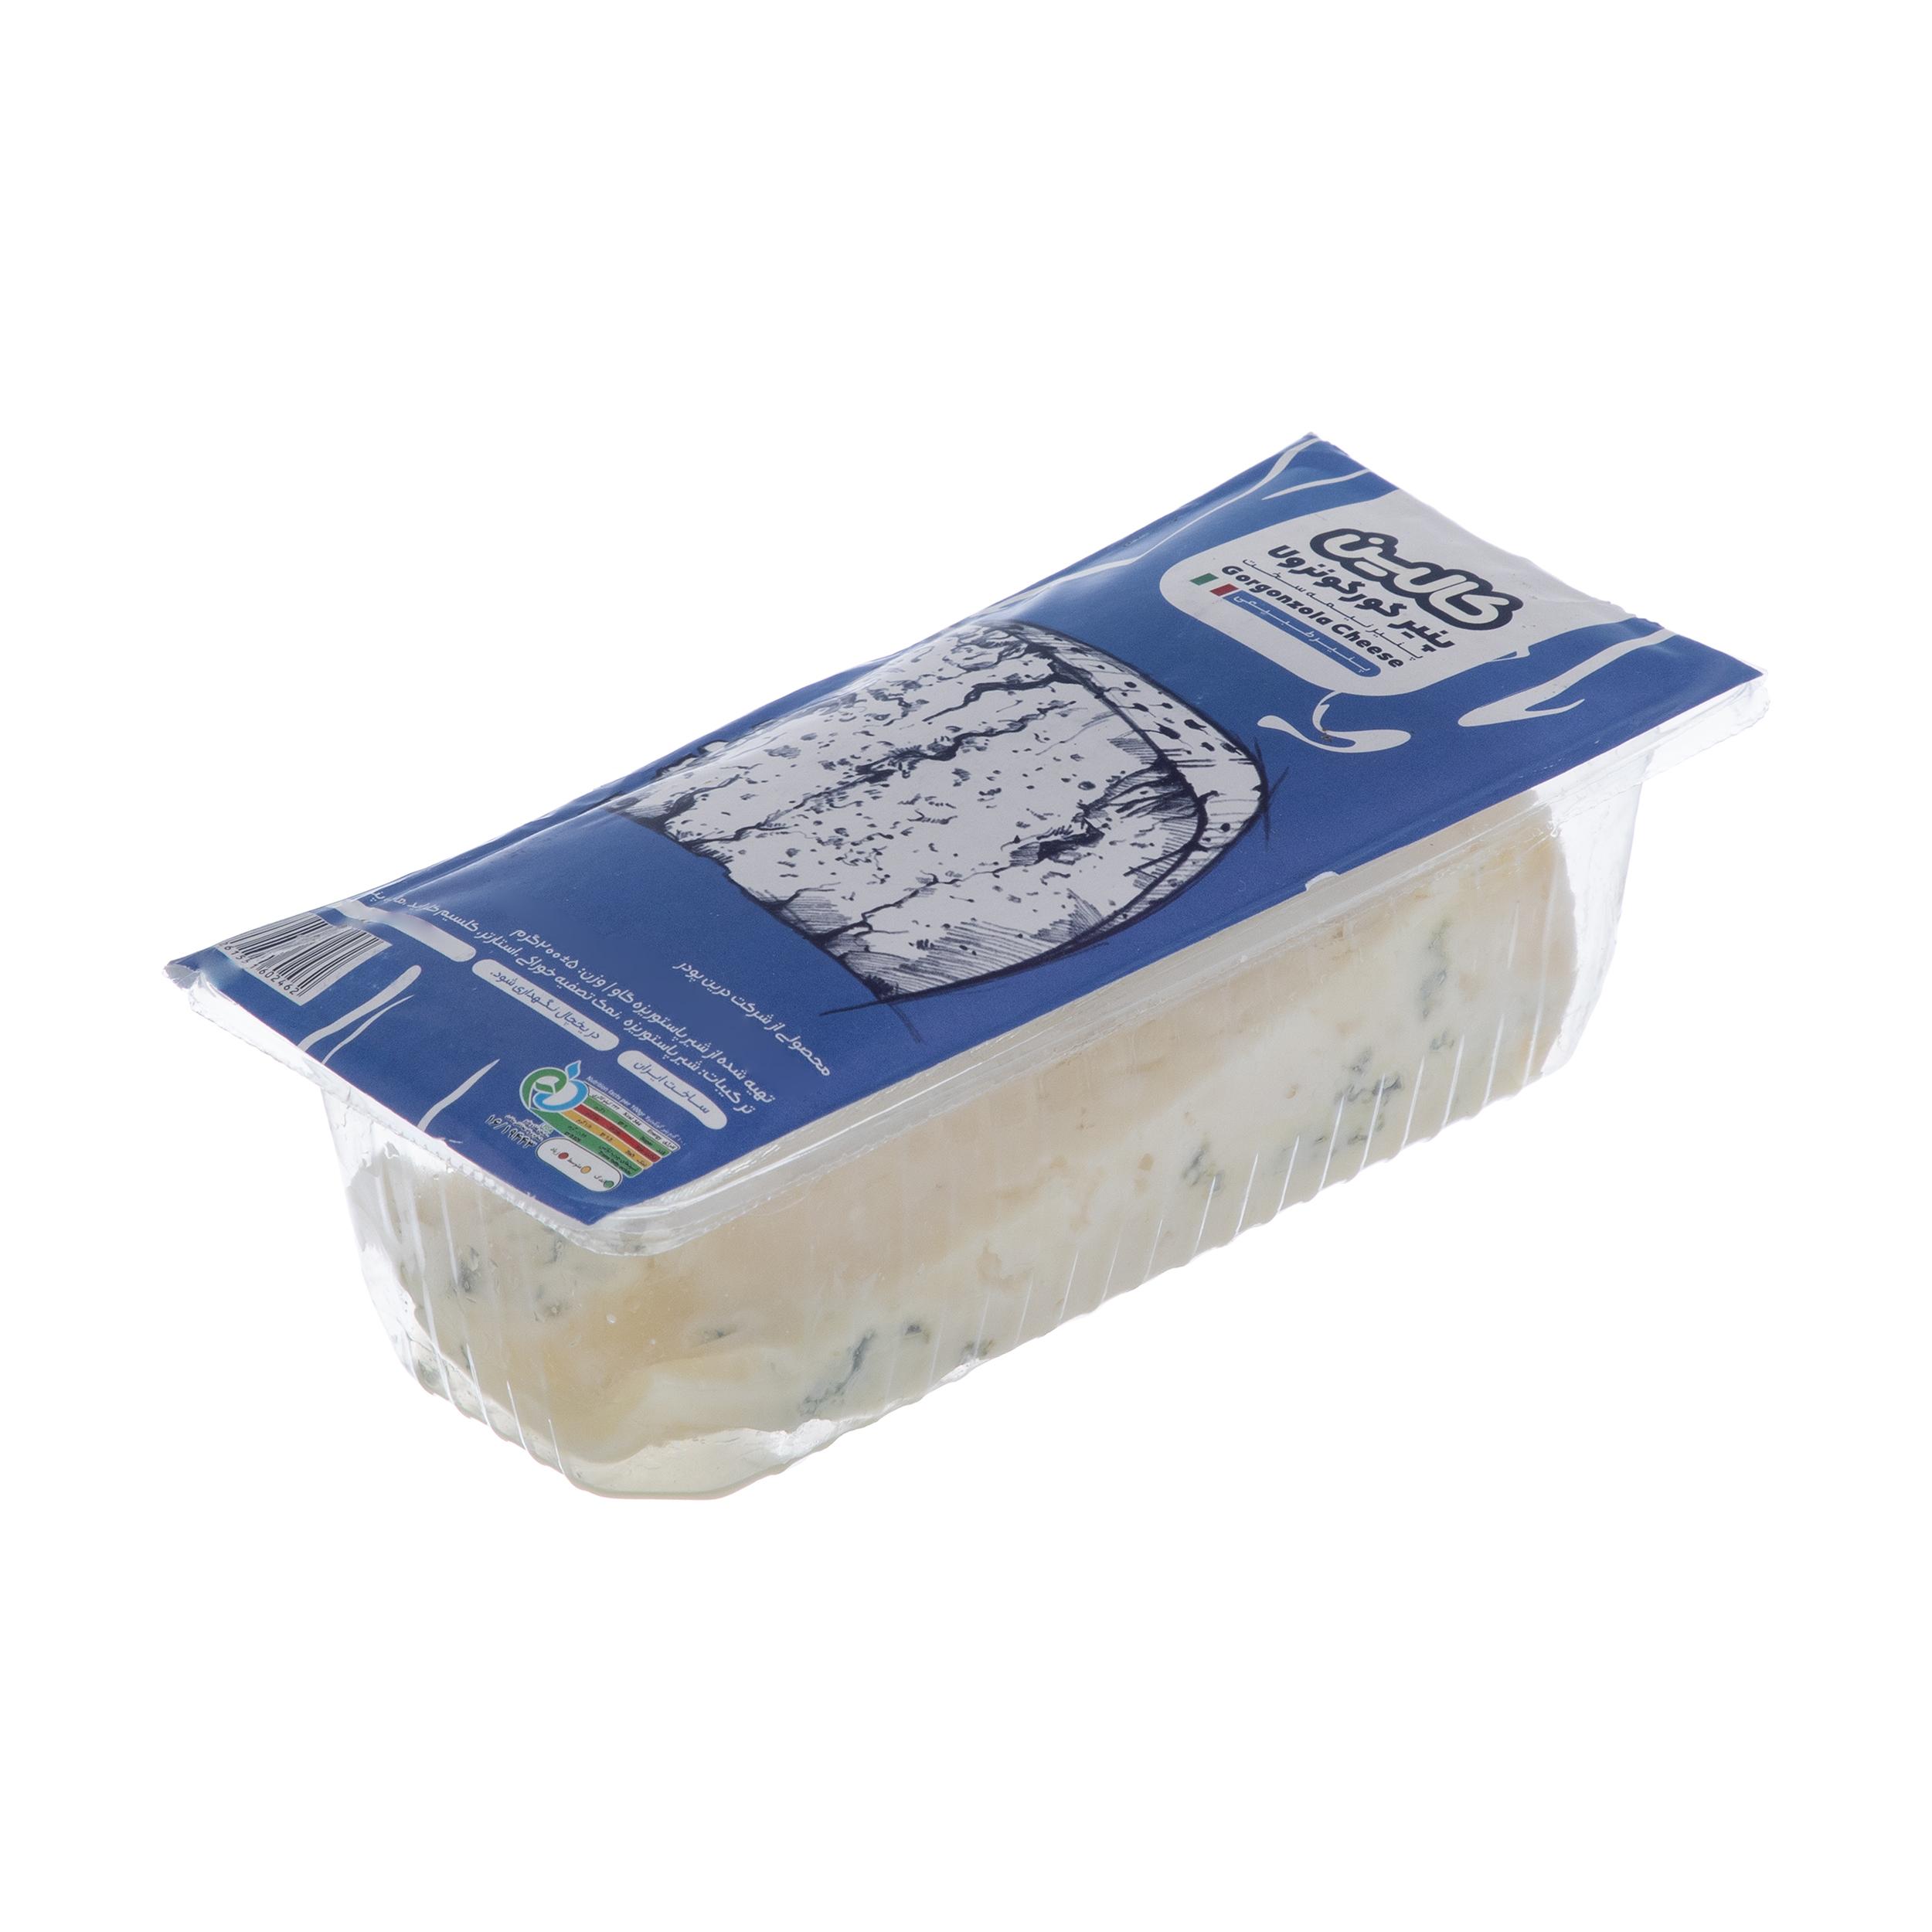 پنیر گورگونزولا کالین - 200 گرم